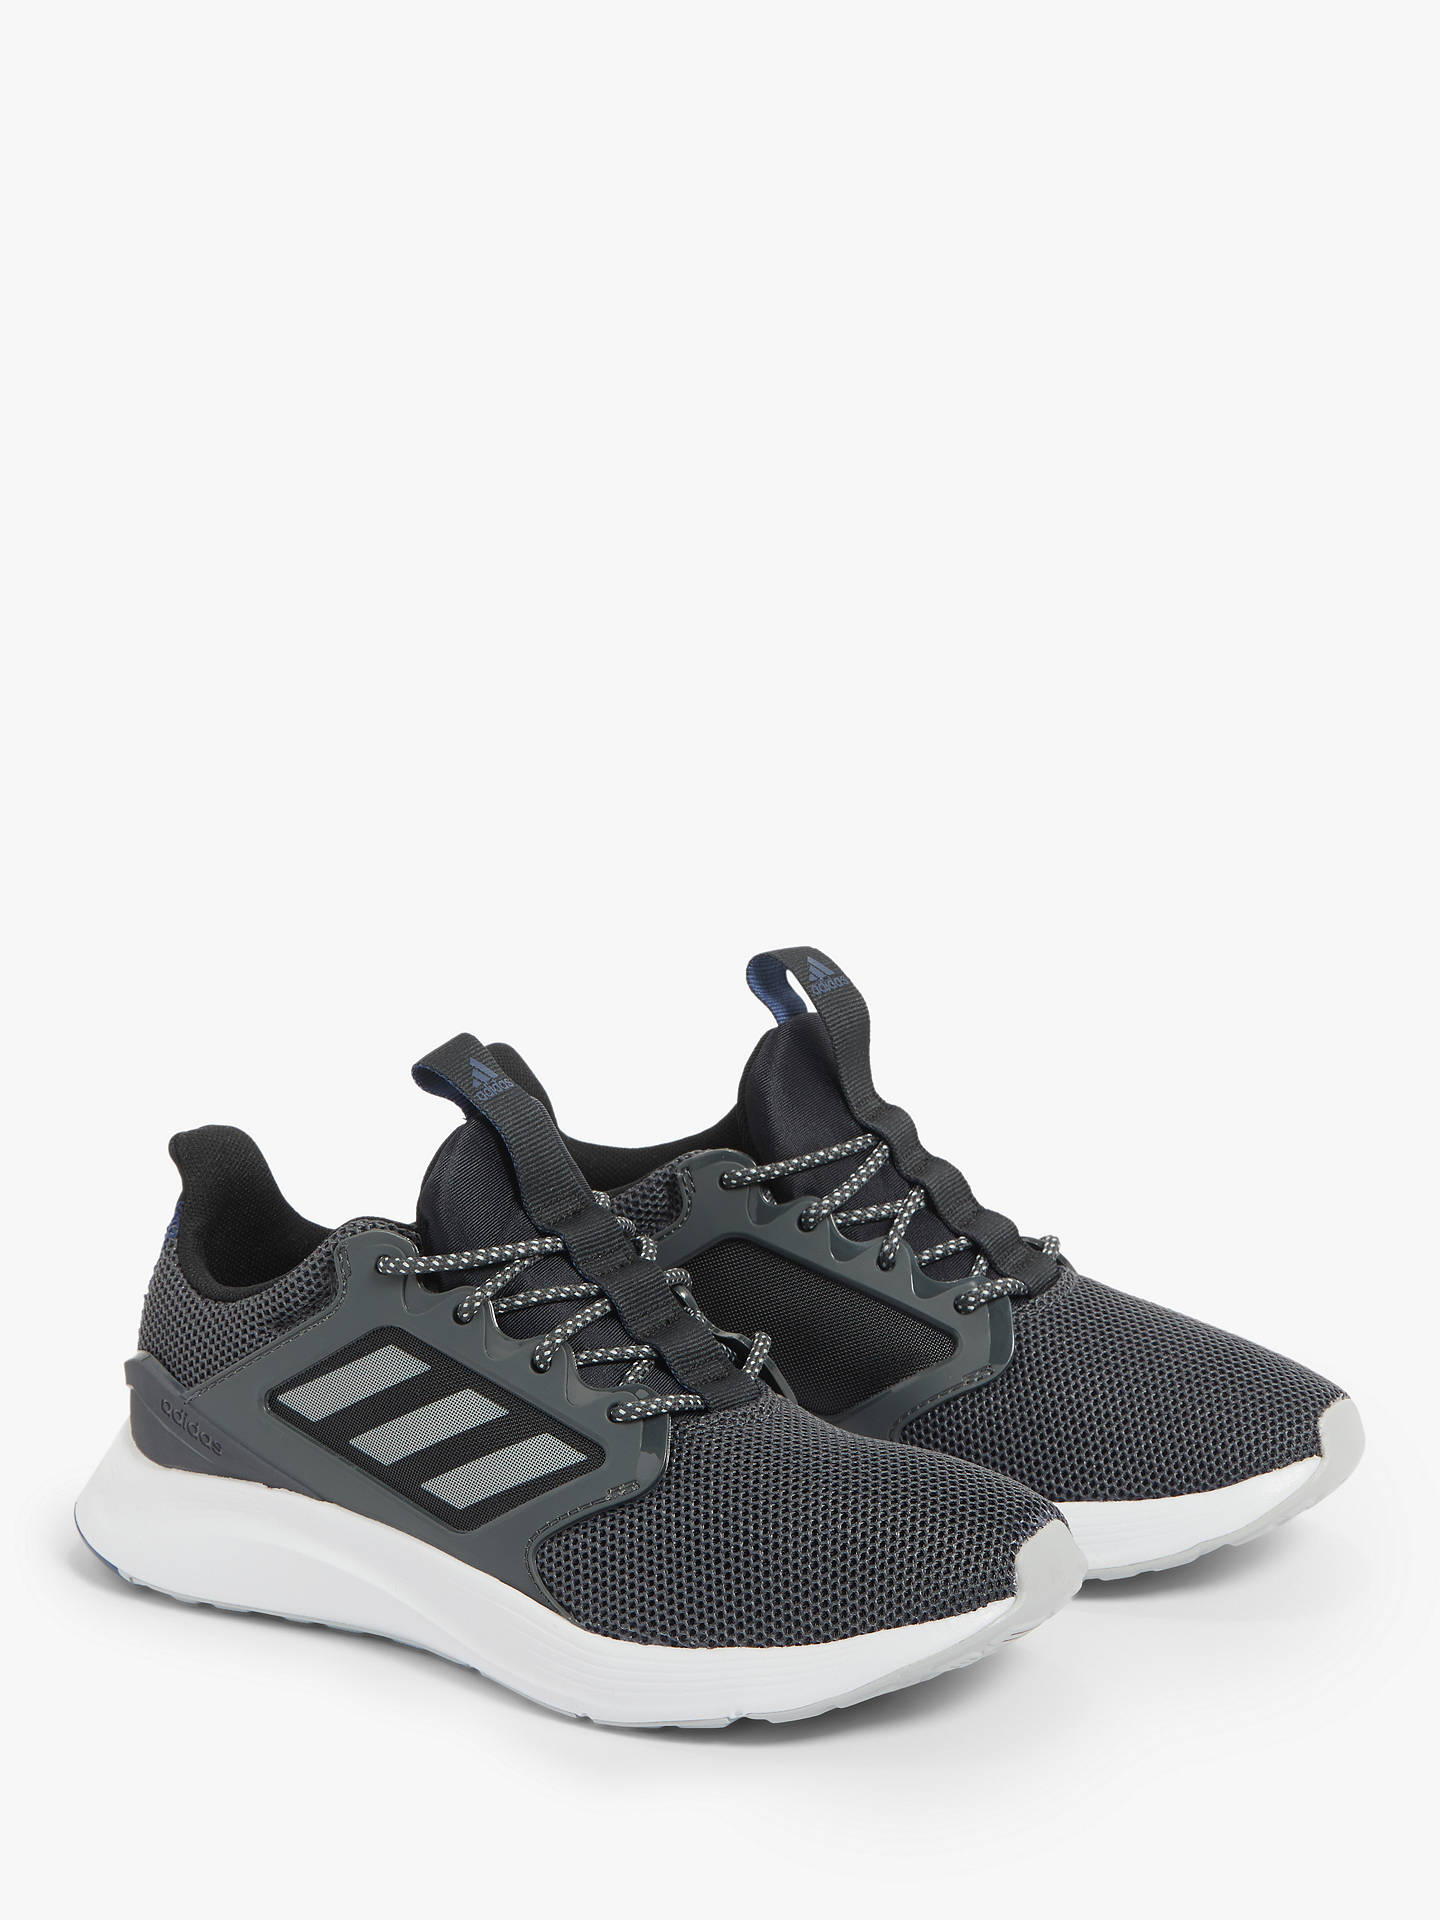 Cubo garra Disfraces  adidas Energy Falcon X Women's Running Shoes, Grey Six/Grey Two/Core Black  at John Lewis & Partners